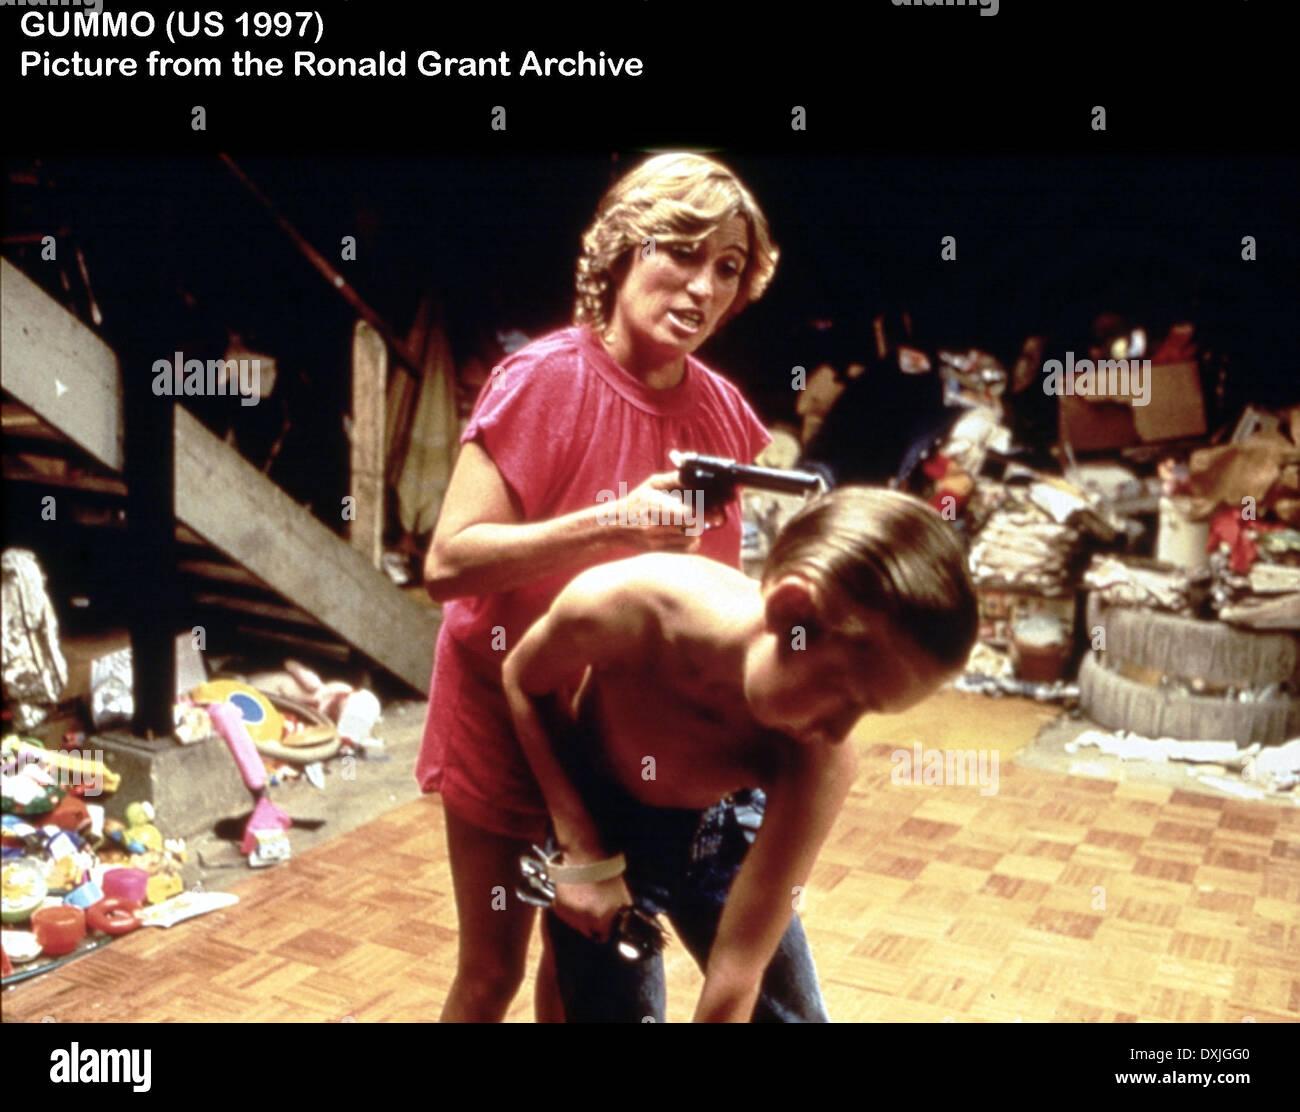 The Movie 1997 Stock Photos & The Movie 1997 Stock Images ...  The Movie 1997 ...